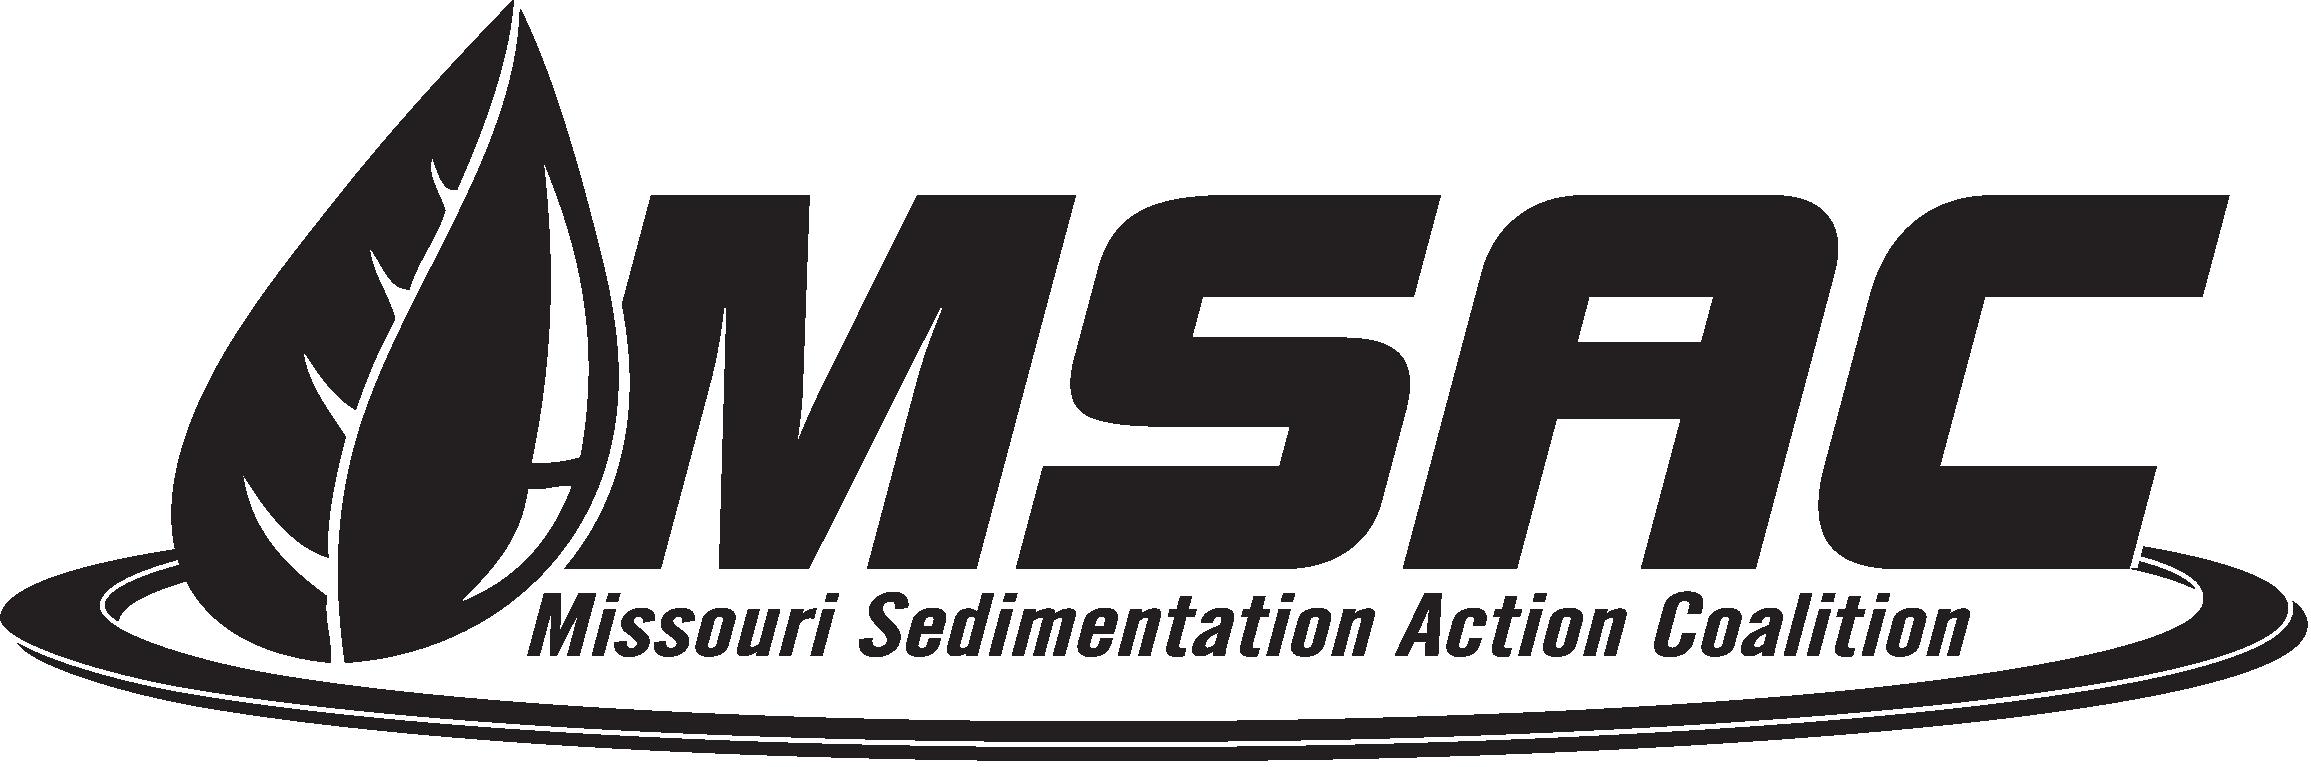 Missouri Sedimentation Action Coalition